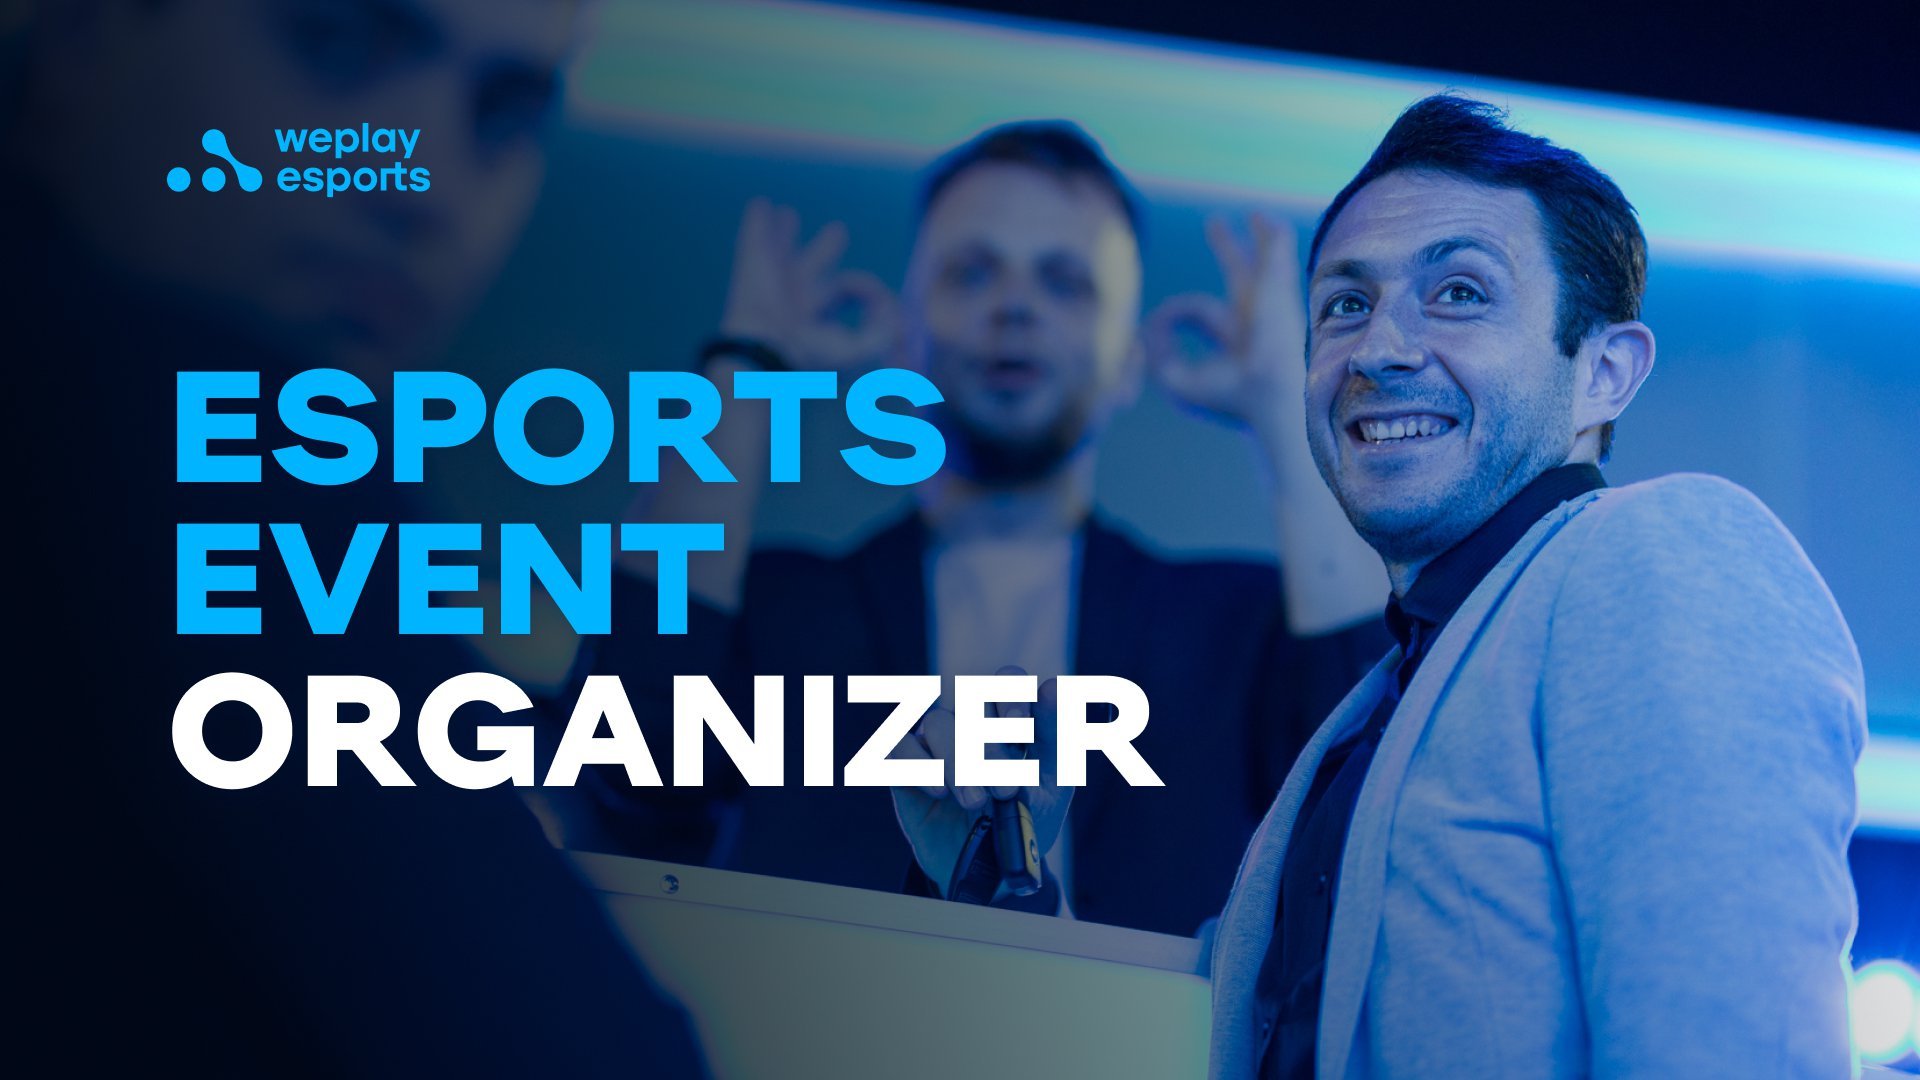 Esports Event Organizer